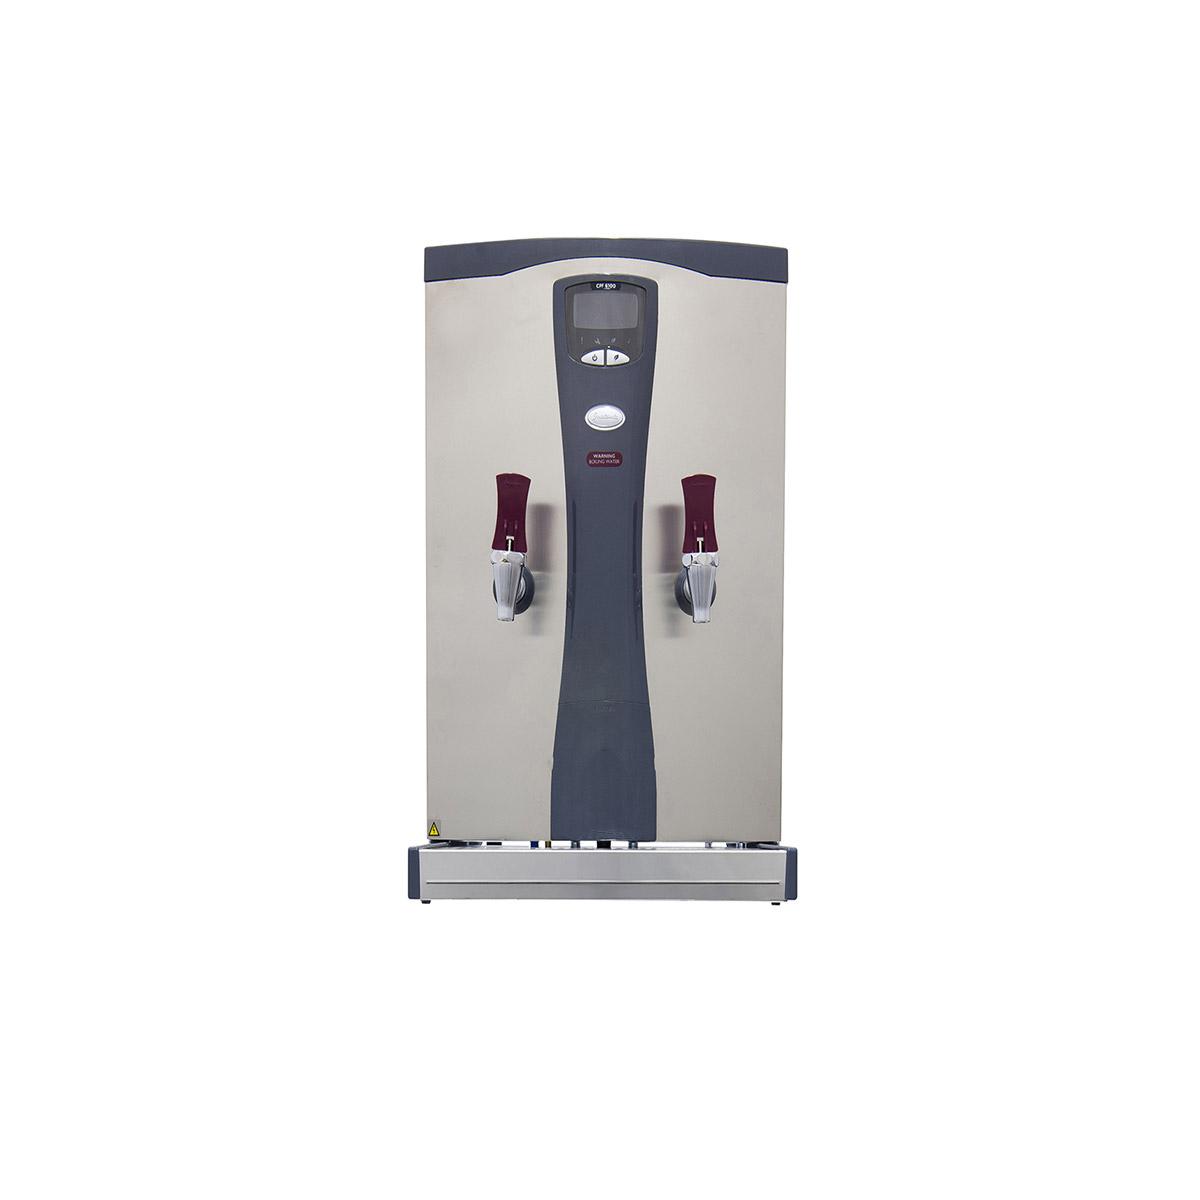 Instanta Sureflow Plus Counter Top Water Boiler CTSP27T/6 Twin Taps Filtered 19Ltr